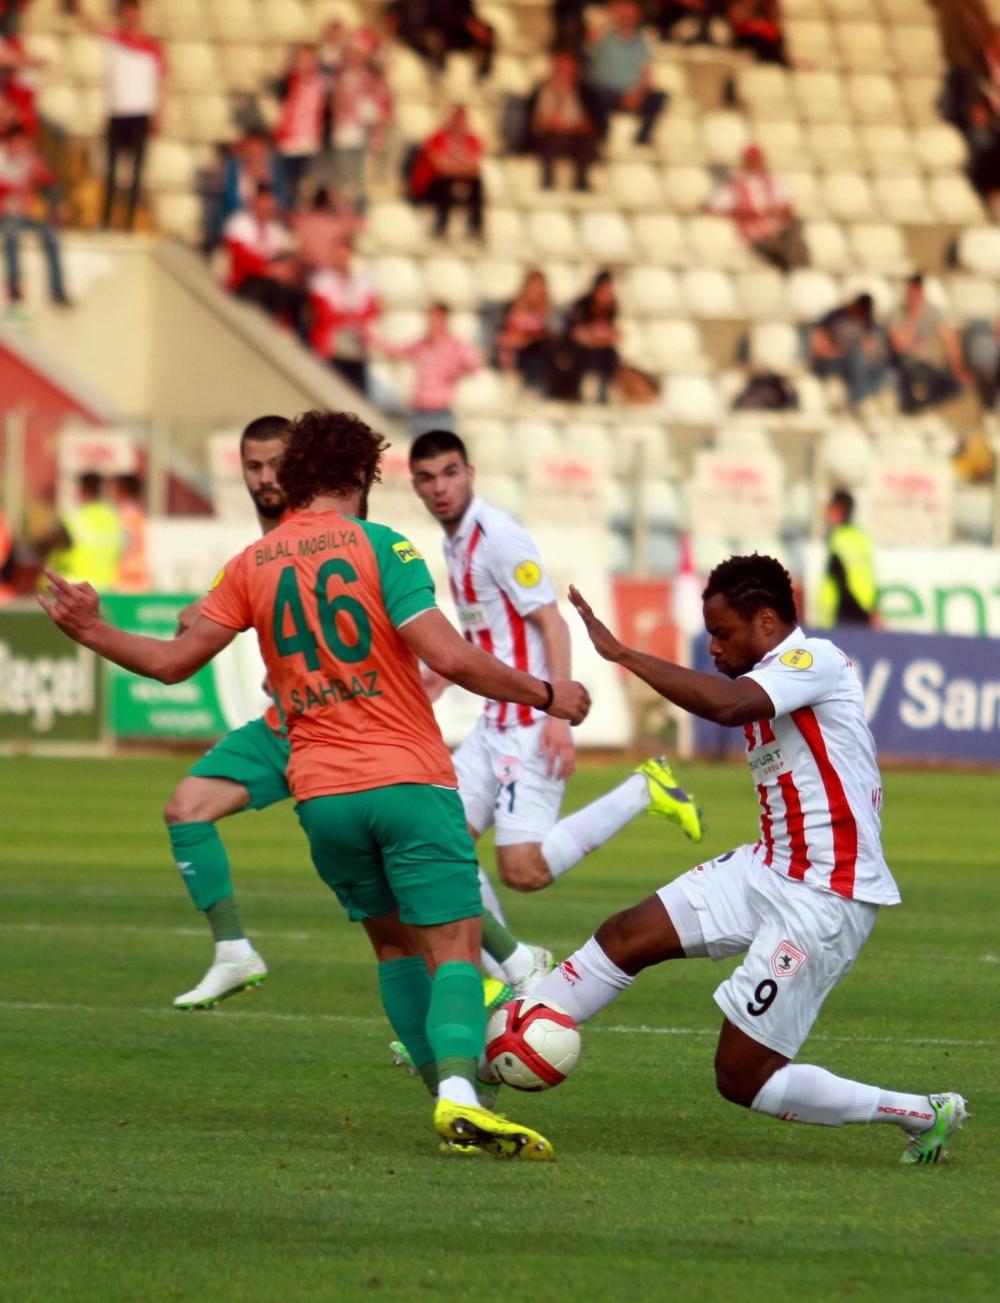 Samsunspor, Albimo Alanyaspor'u 5-1 Yendi galerisi resim 3